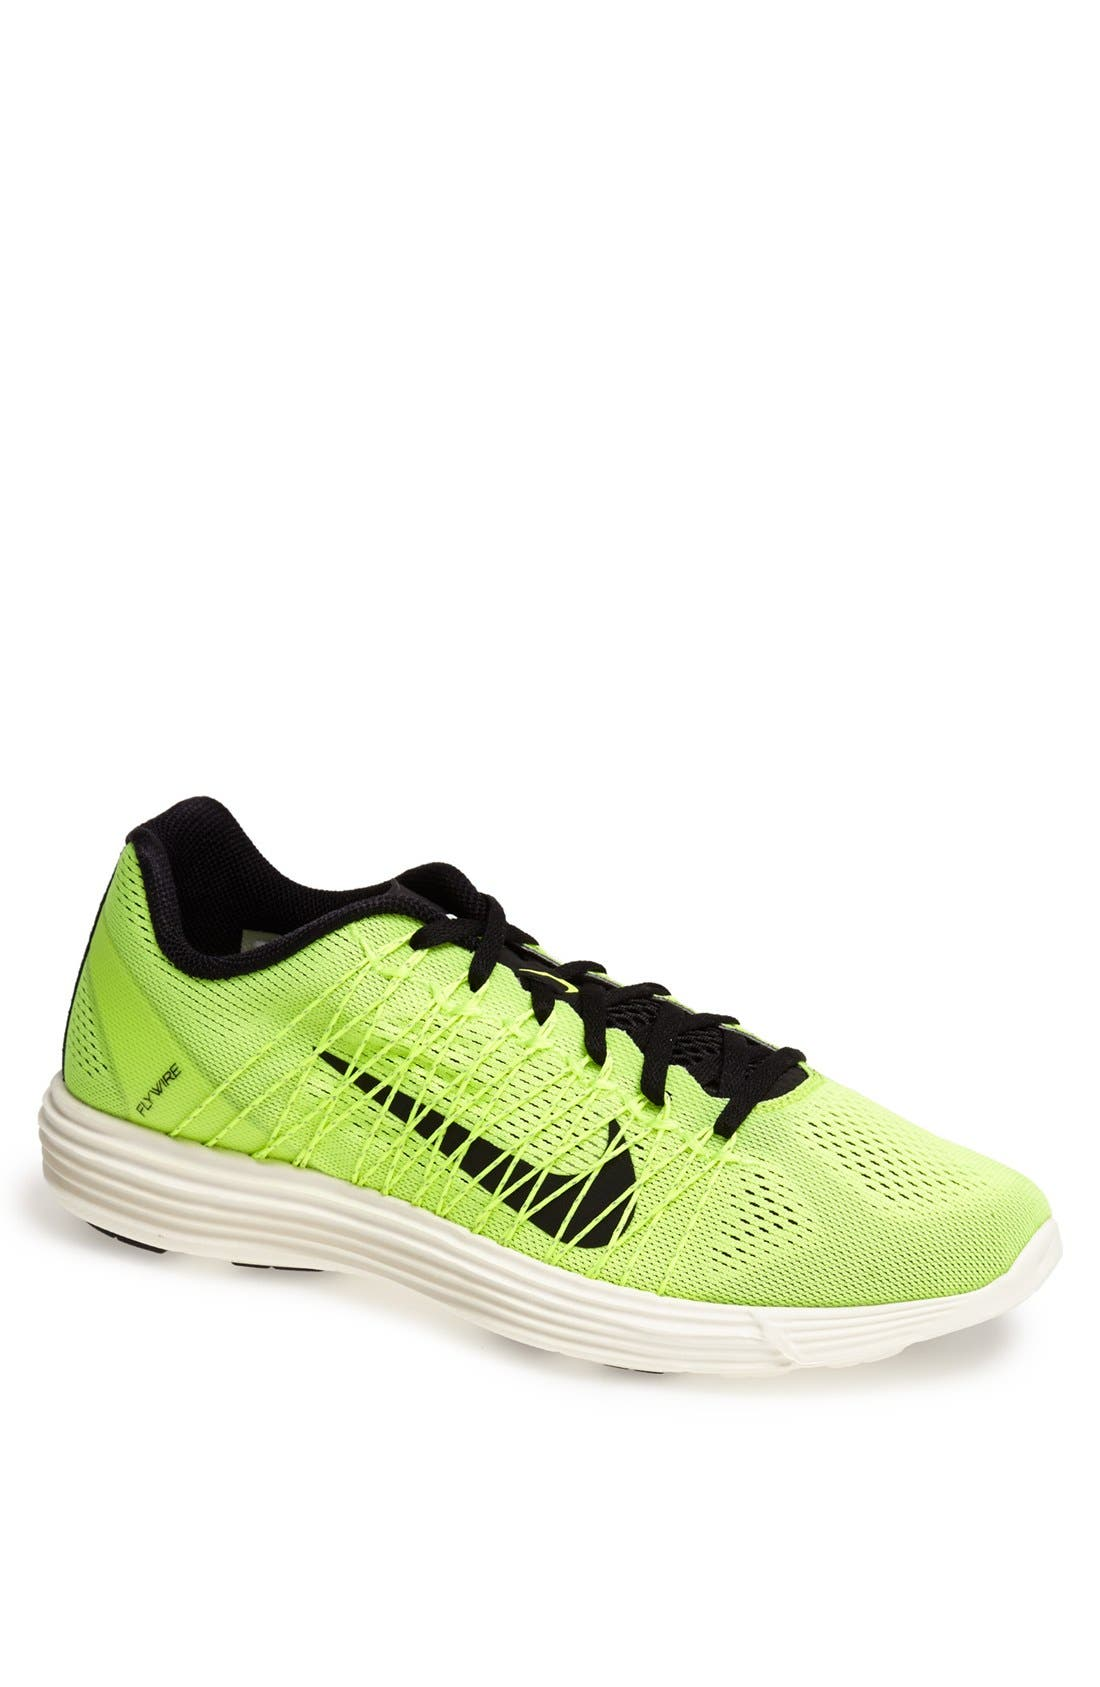 Alternate Image 1 Selected - Nike 'Lunaracer+ 3' Running Shoe (Men)